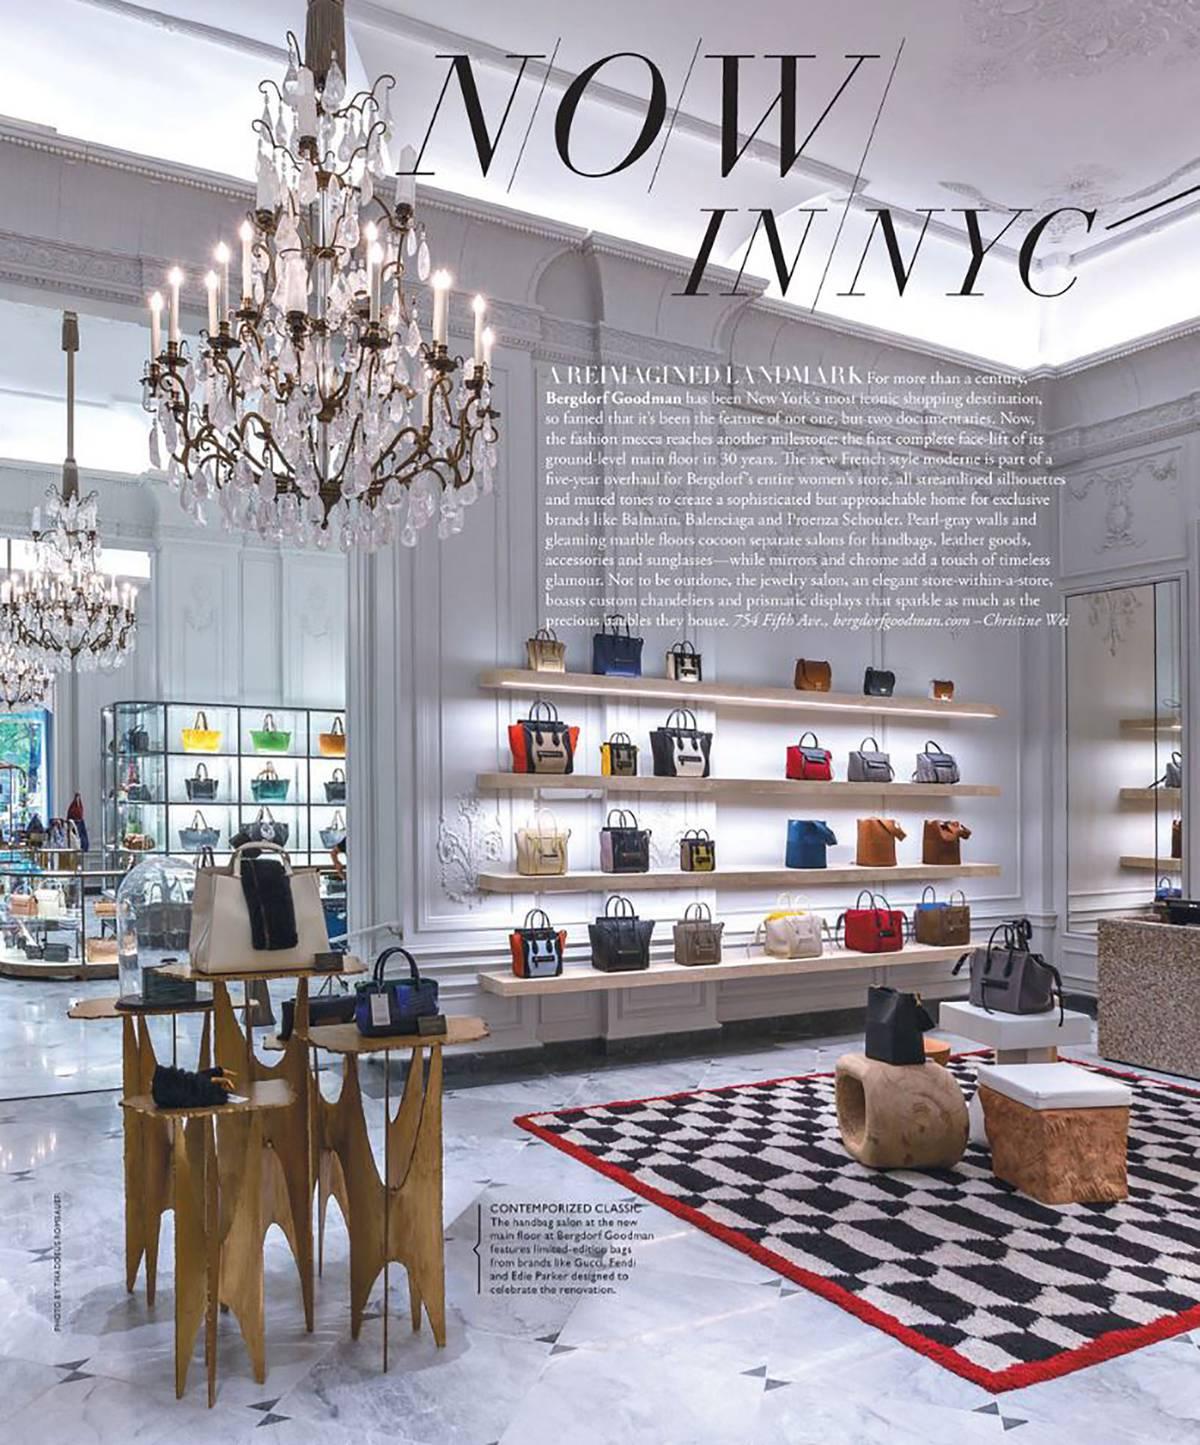 The New Main Floor at Bergdorf Goodman - Architect: Neumann & Rudy